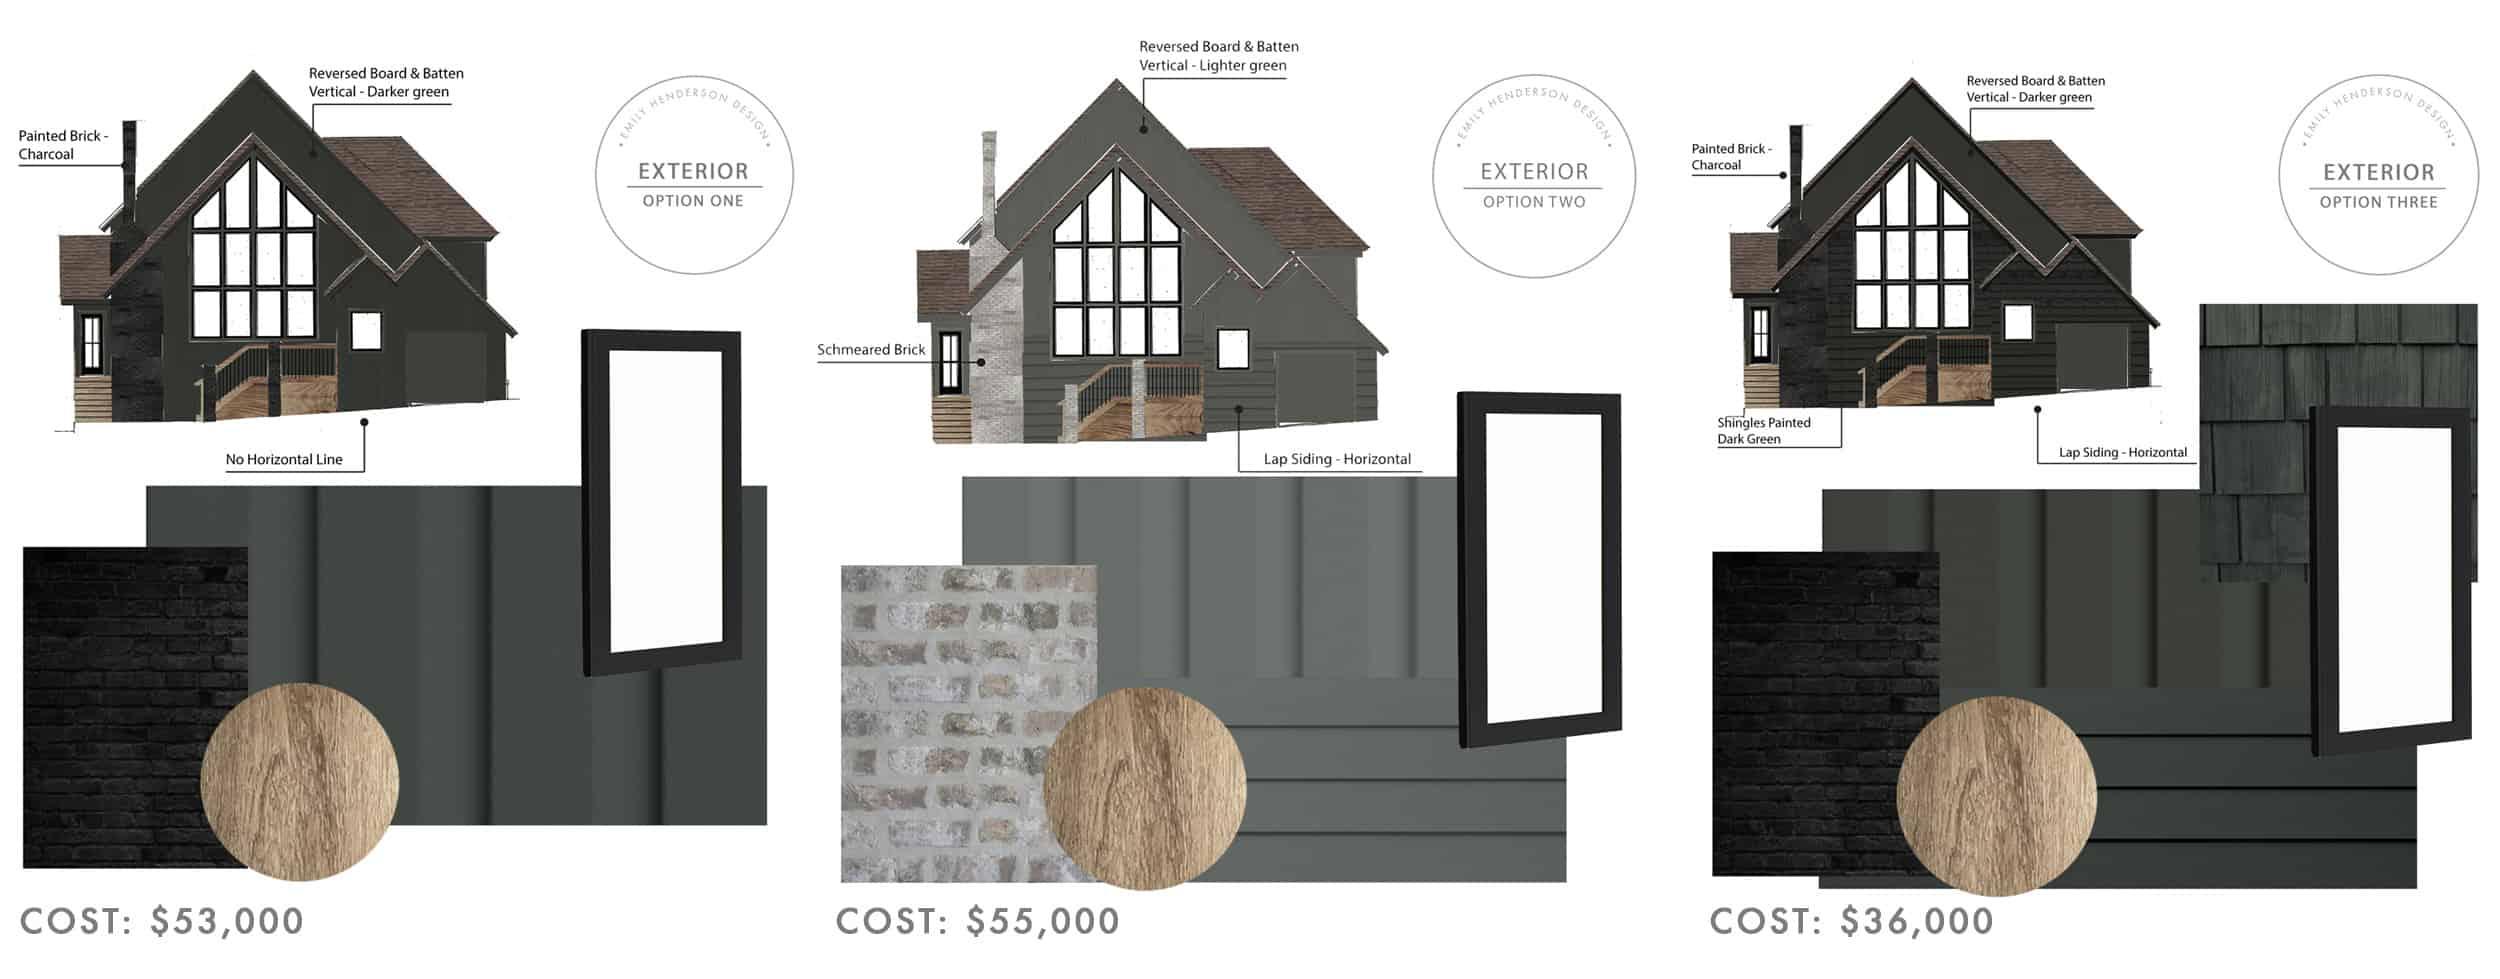 Emily Henderson Mountain Fixer I Design You Decide Exterior 3 Options 1